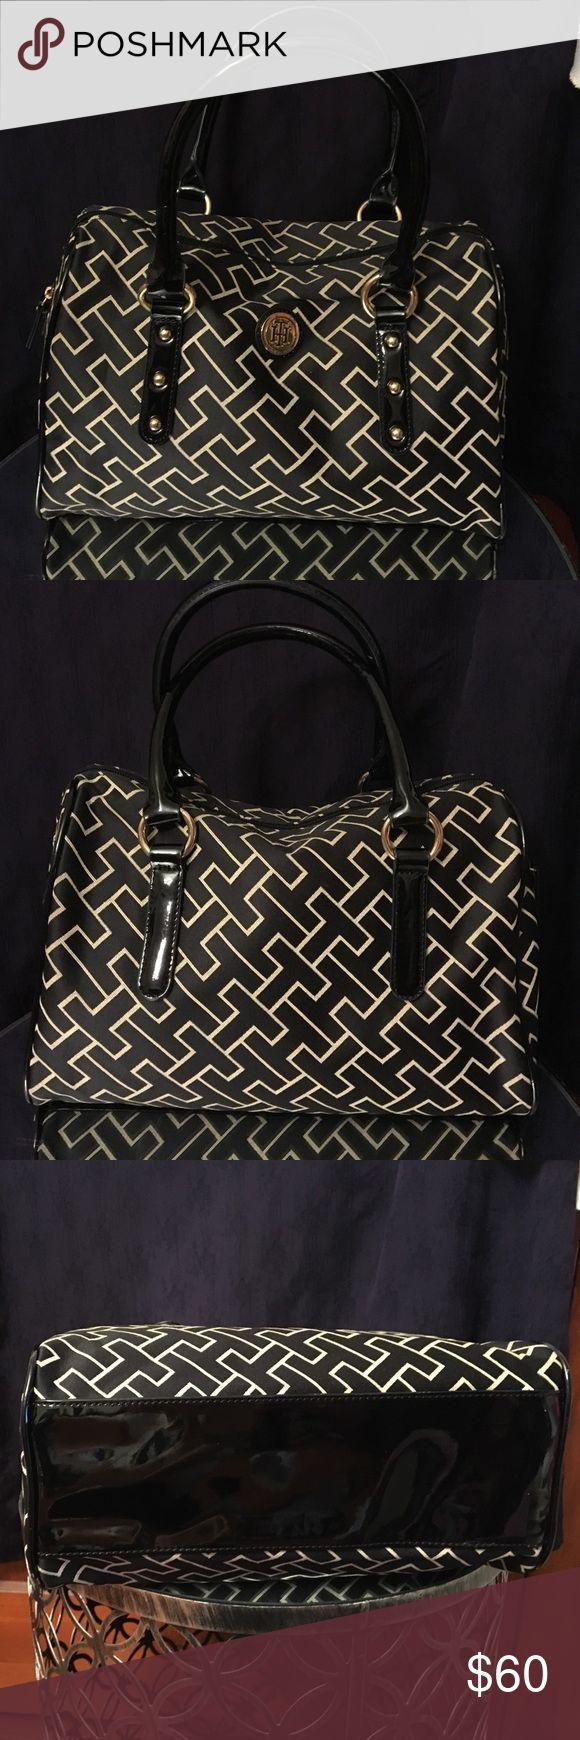 NWOT Tommy Hilfiger handbag NEW! TH purse. Black/Tan/gold. 1 zipper pocket inside/2 smaller pockets. Approx measurements: 16x4x8 Tommy Hilfiger Bags